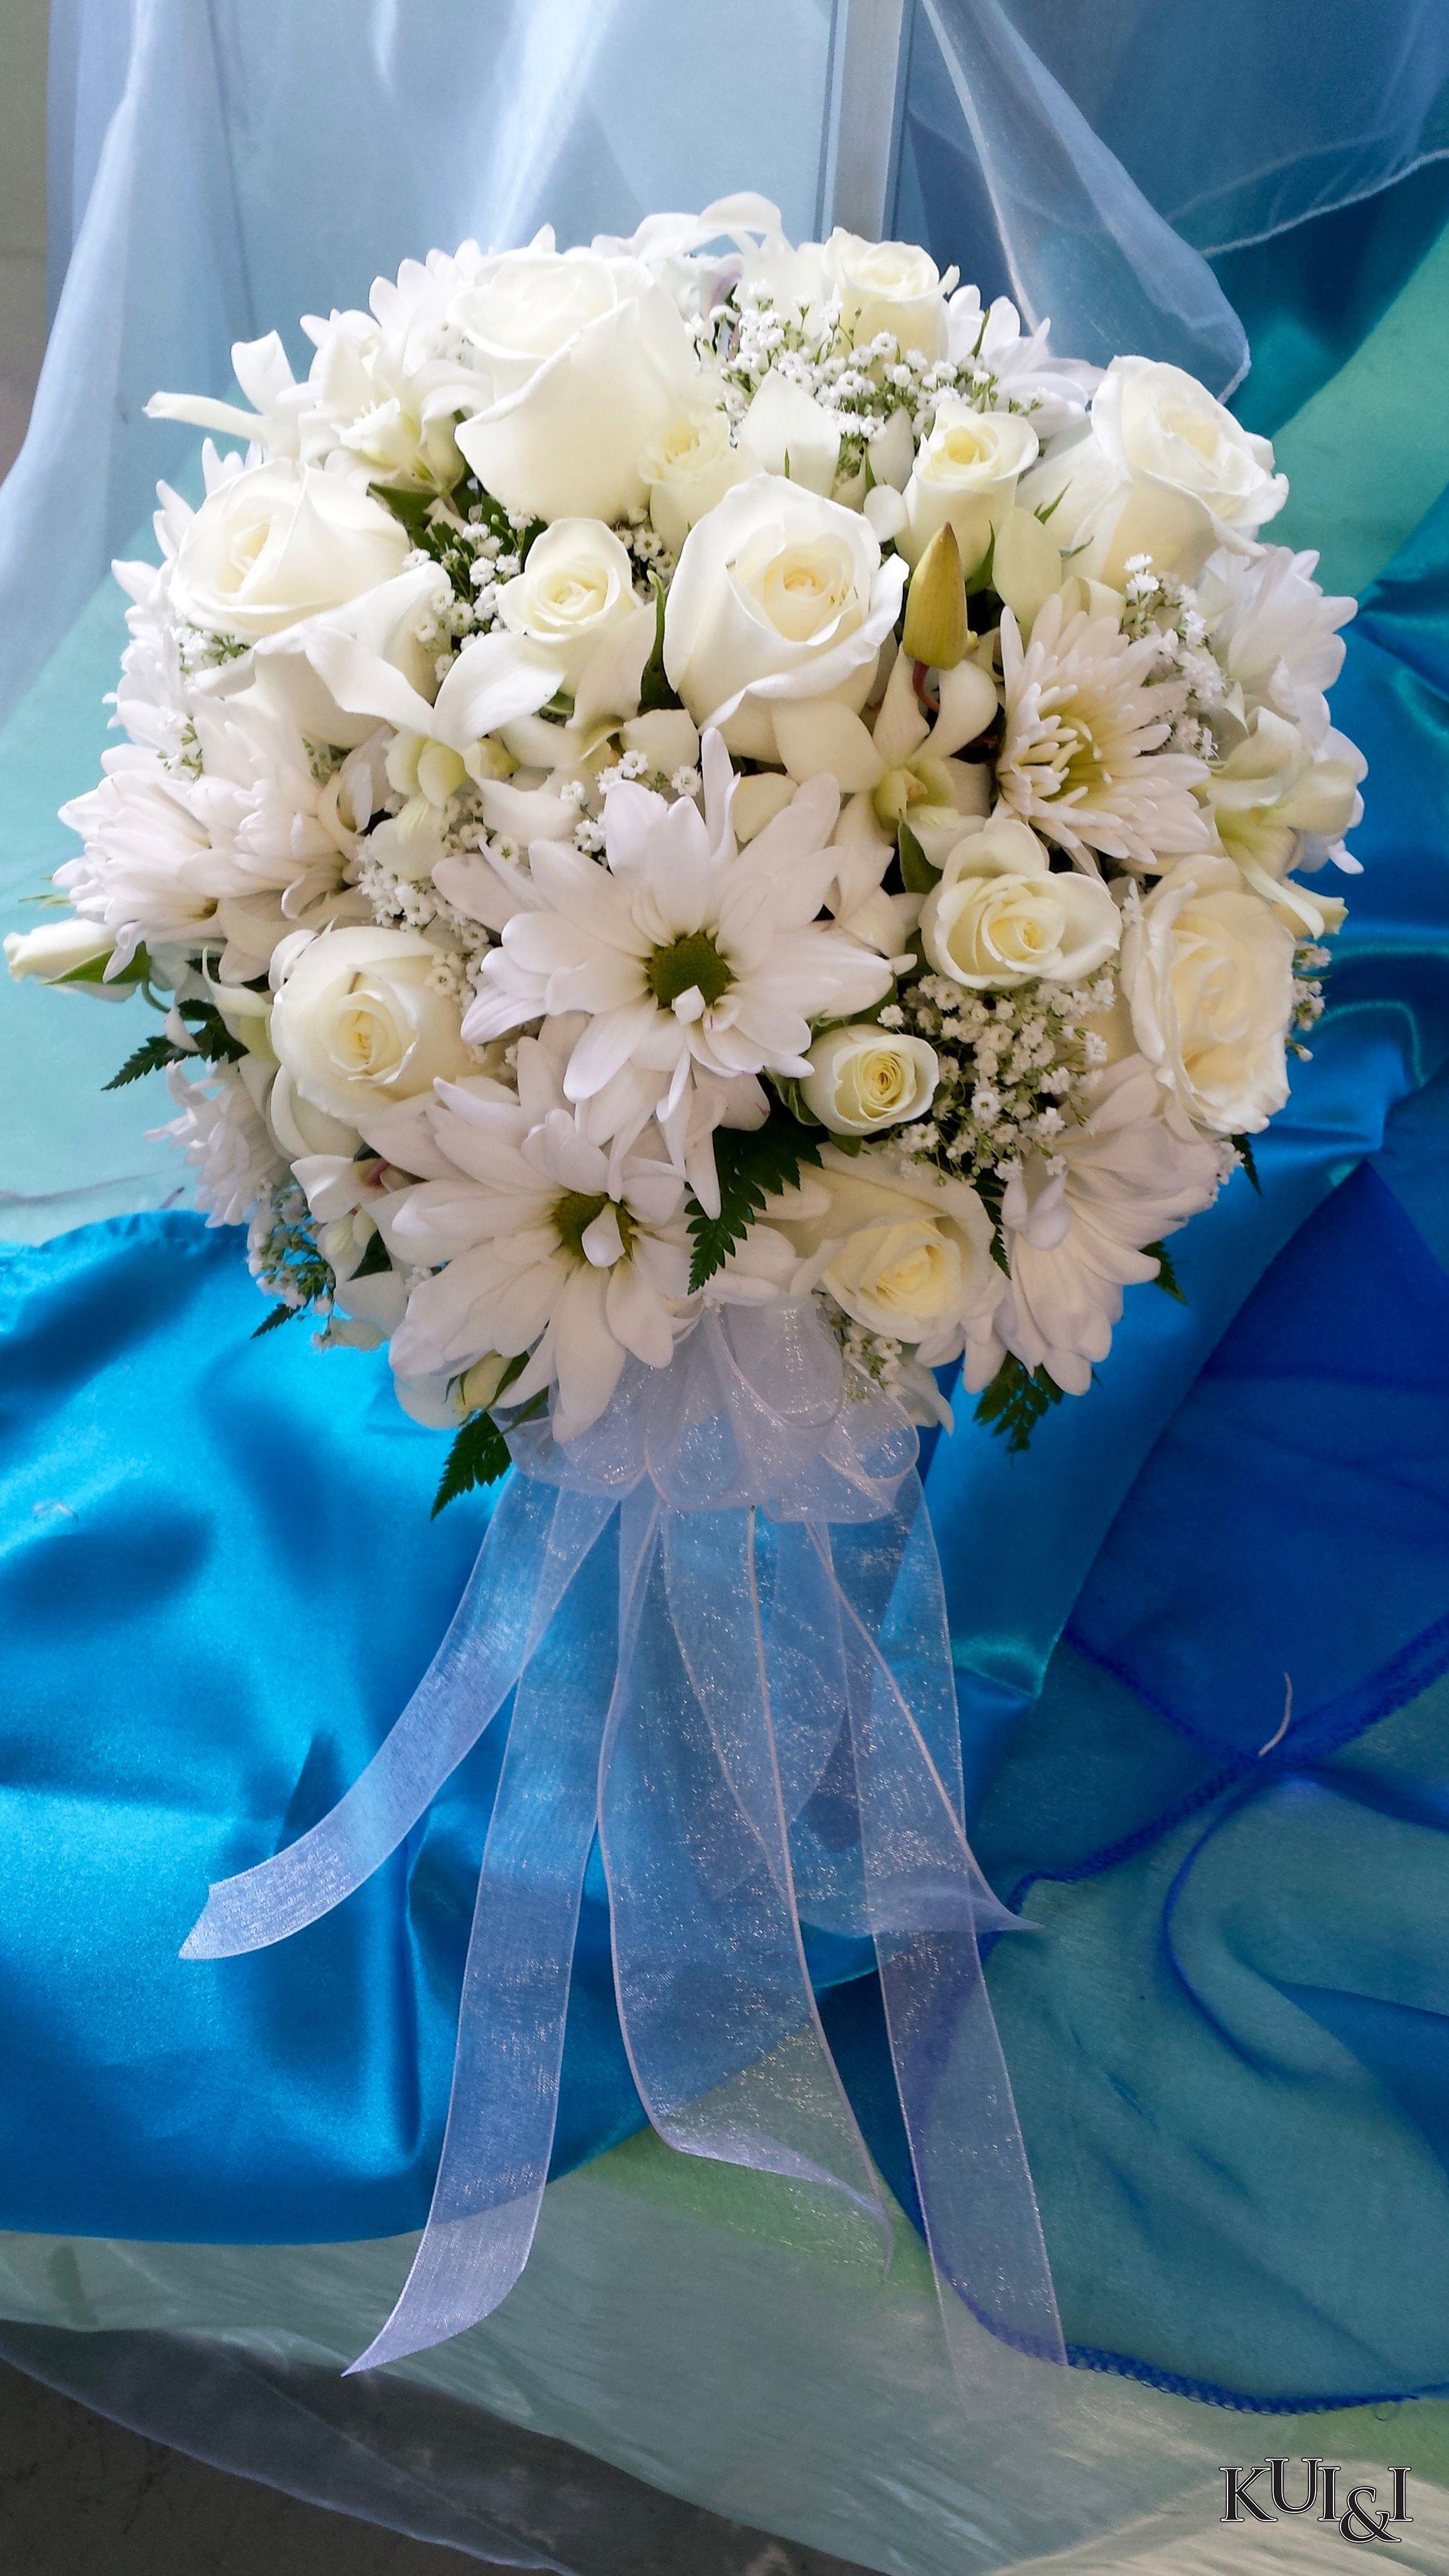 White Spherical Wedding Bouquet Kui I Florist Llc Hilo Hawaii